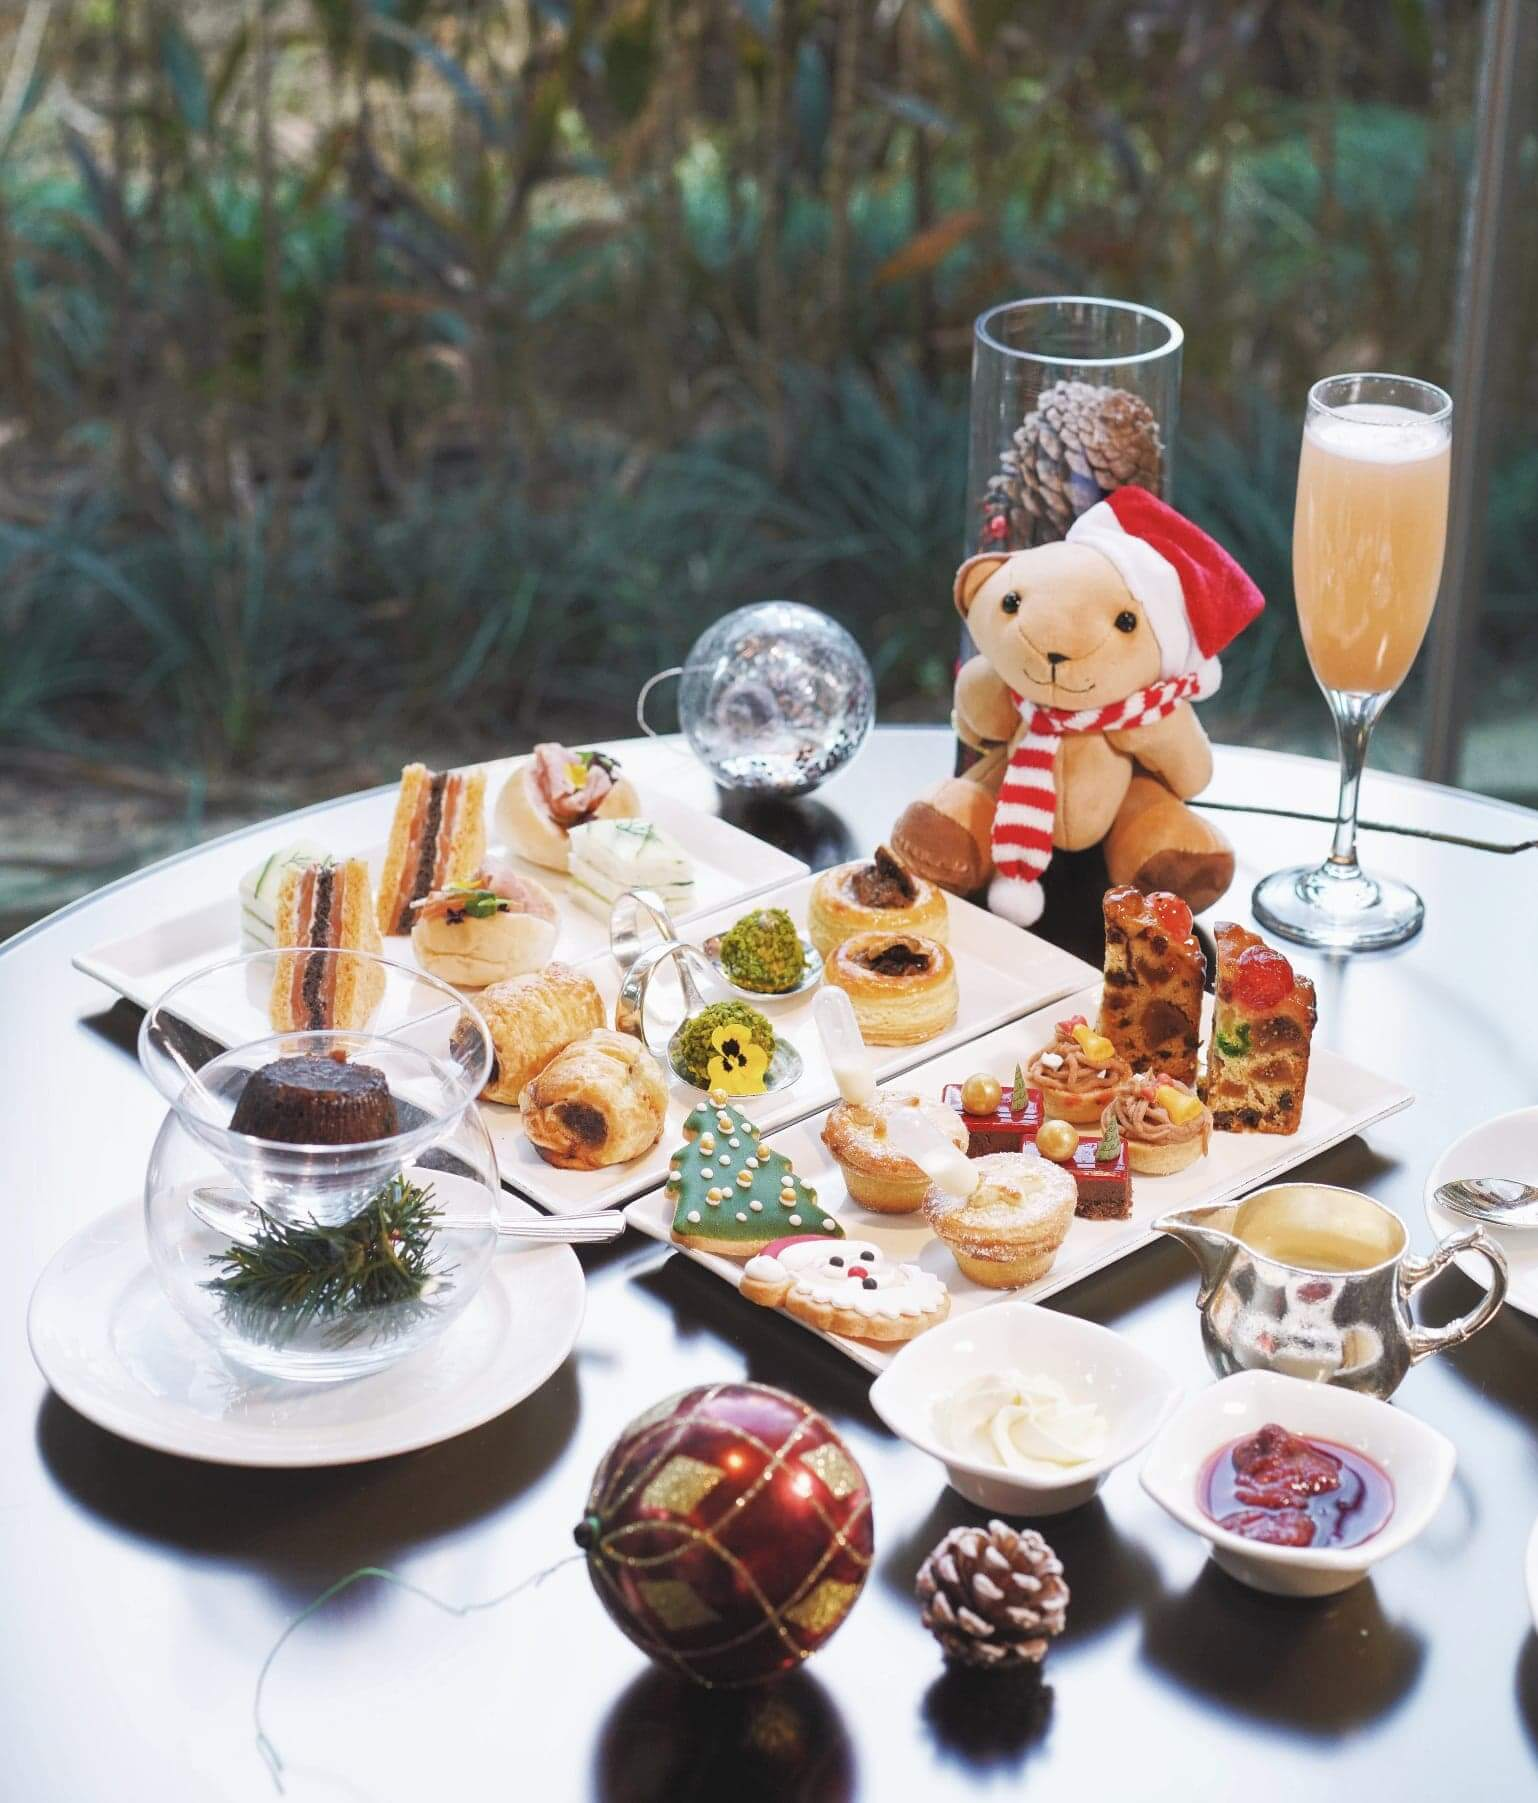 「Waltz of Festive Joys」節慶下午茶, 薈萃一系列傳統節慶美點及經典甜品。